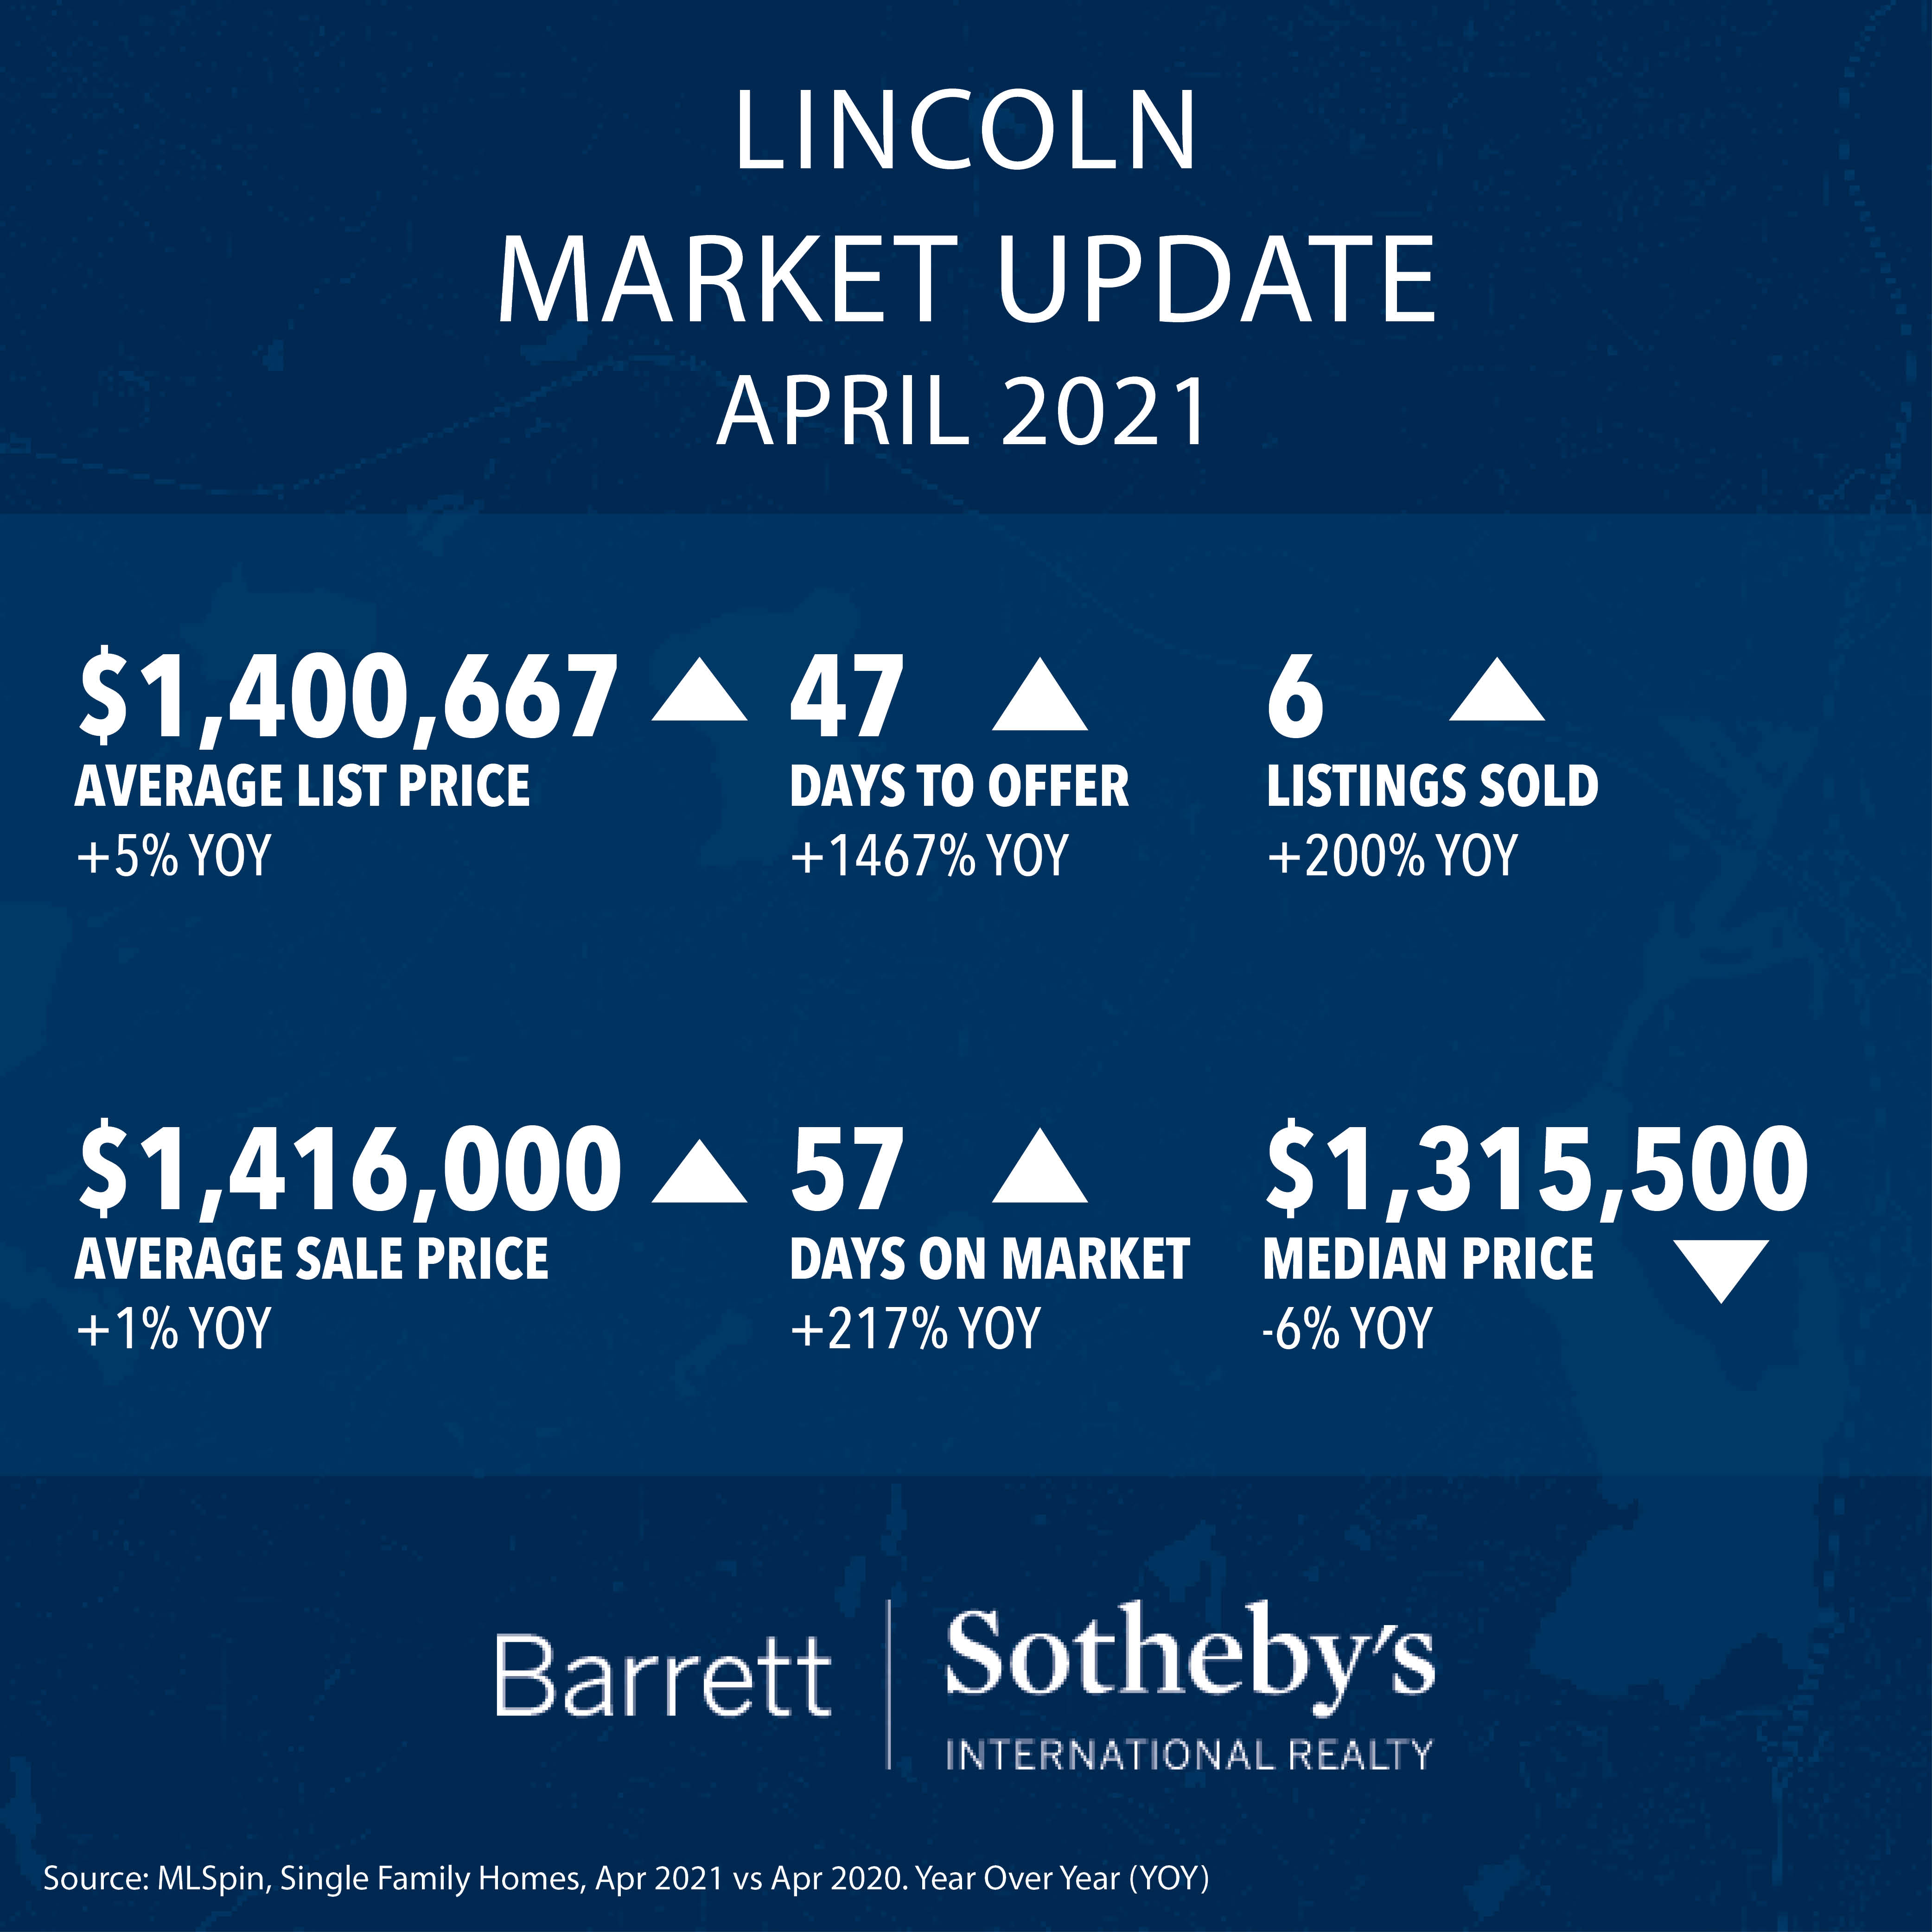 Lincoln Real Estate Market Update